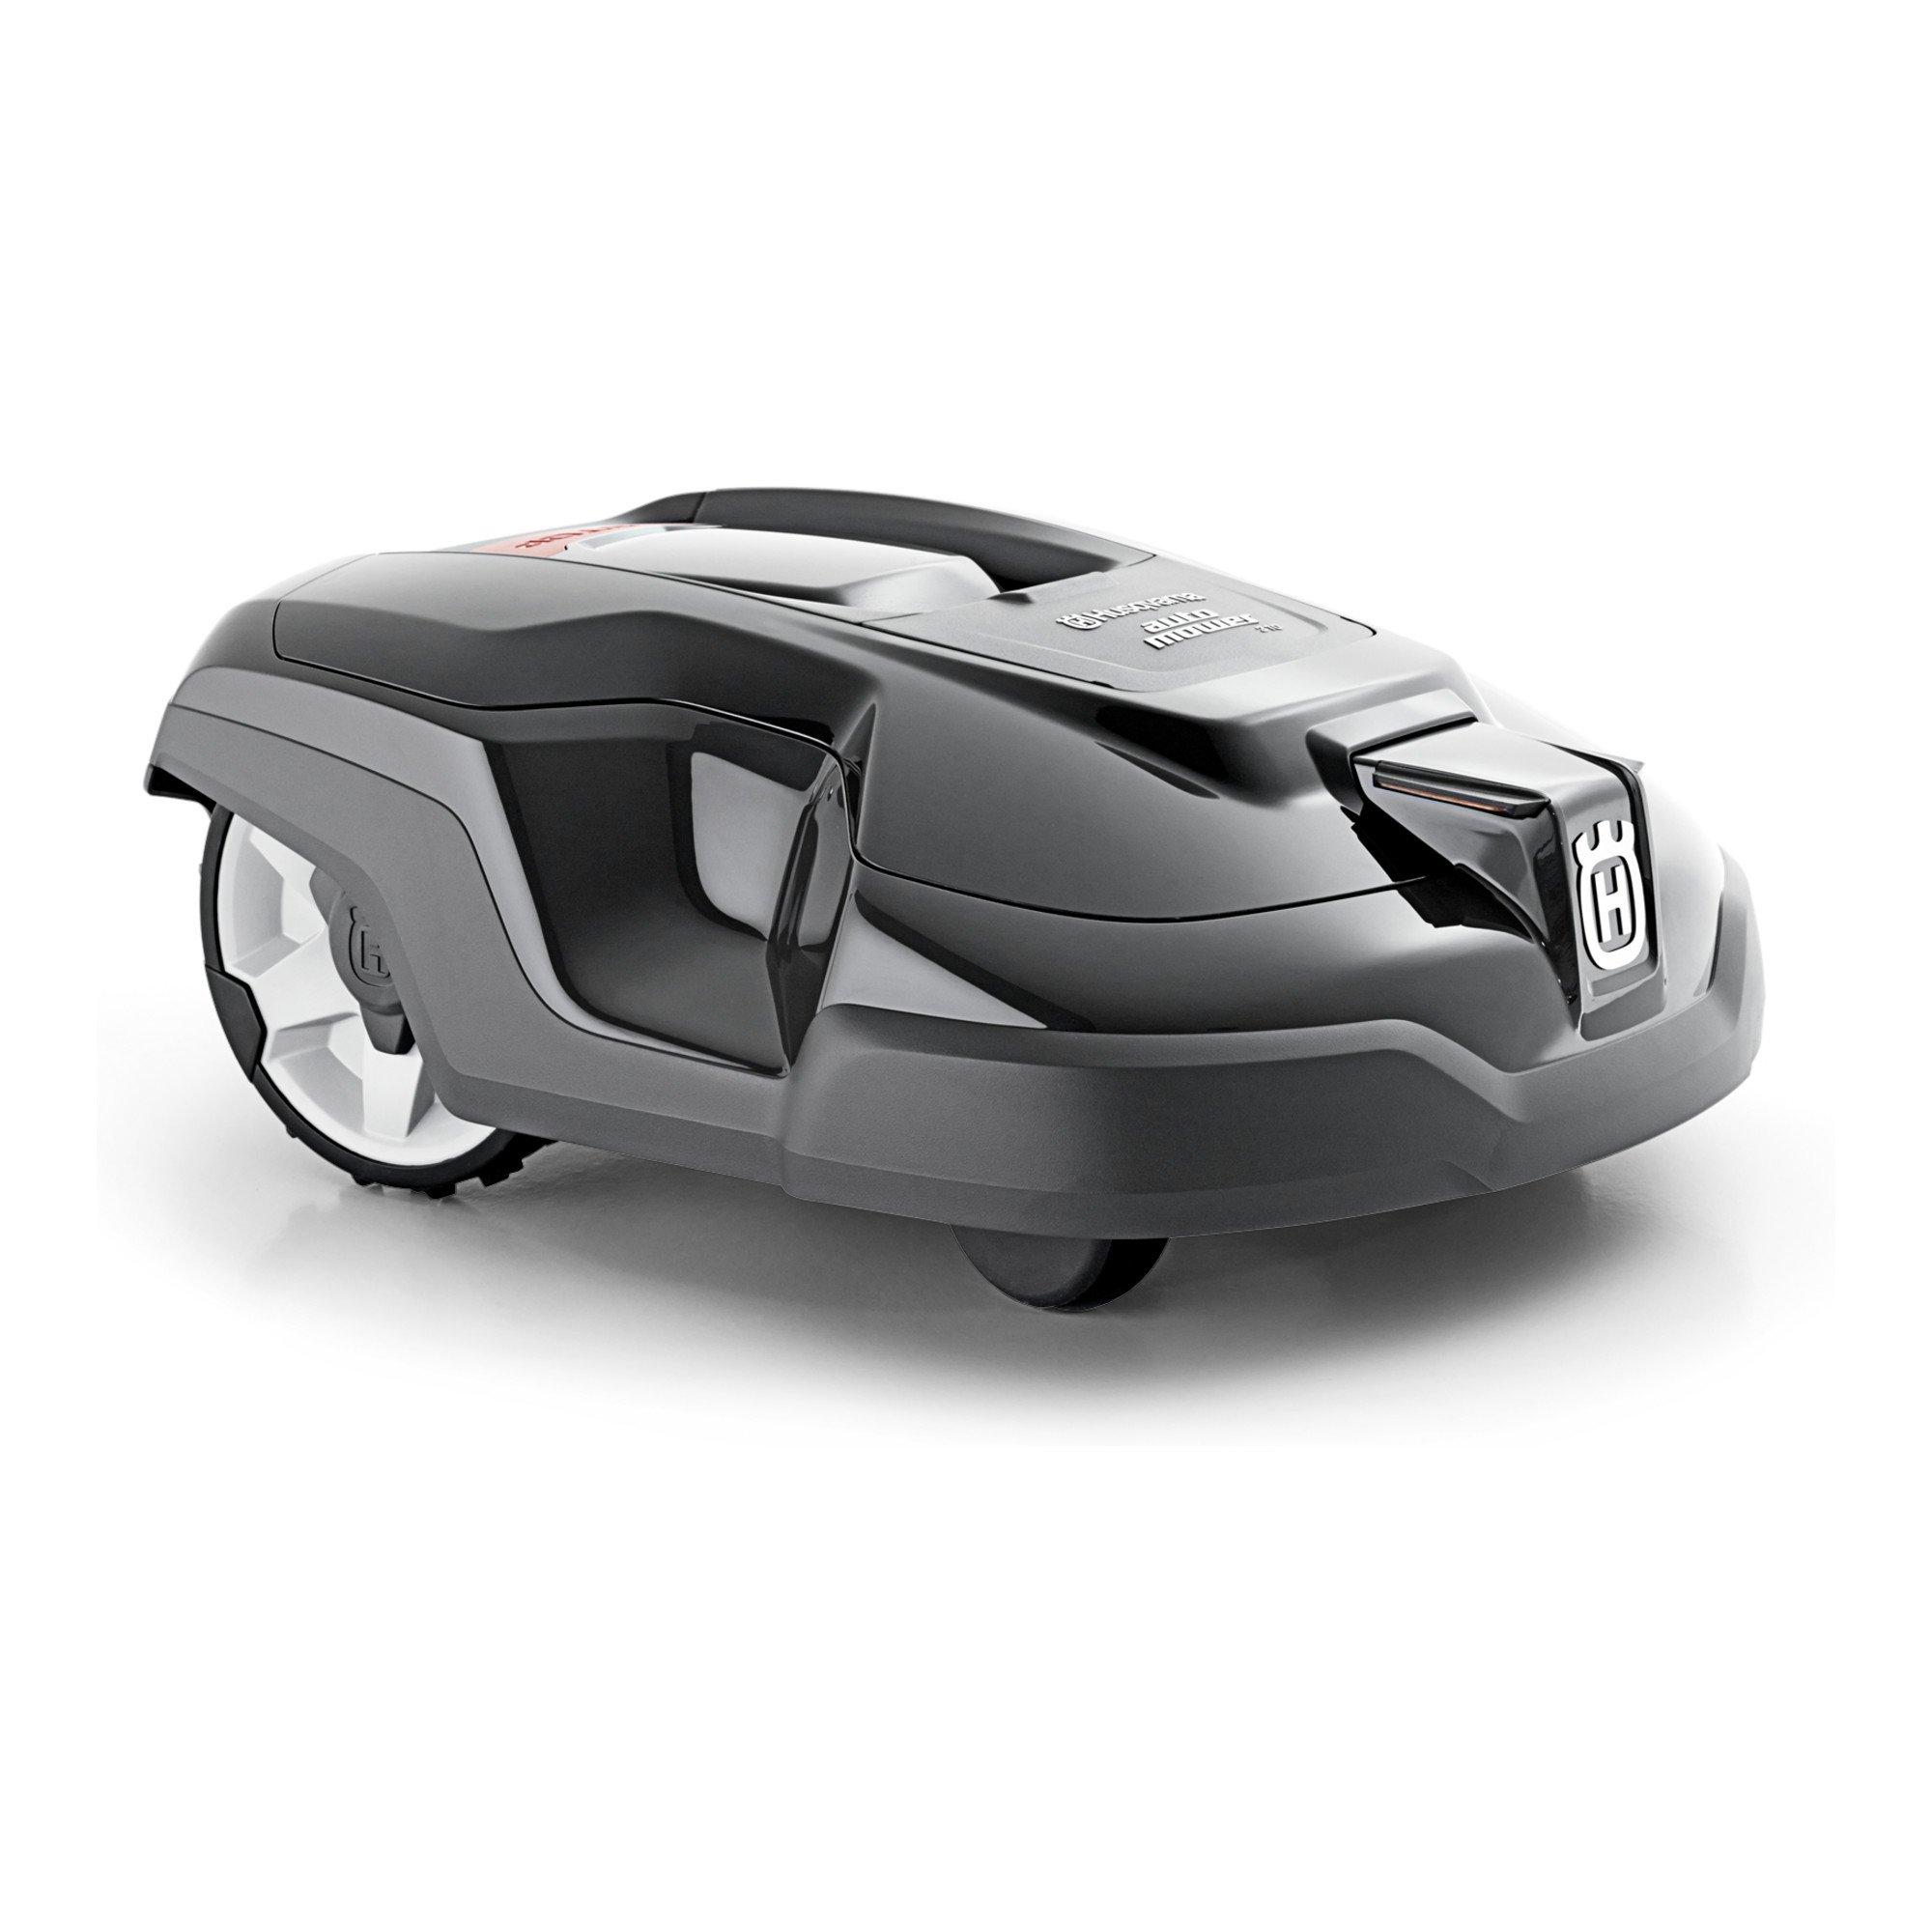 Husqvarna Mähroboter Automower 310 (Modell 2019) bis 1000 qm Fläche